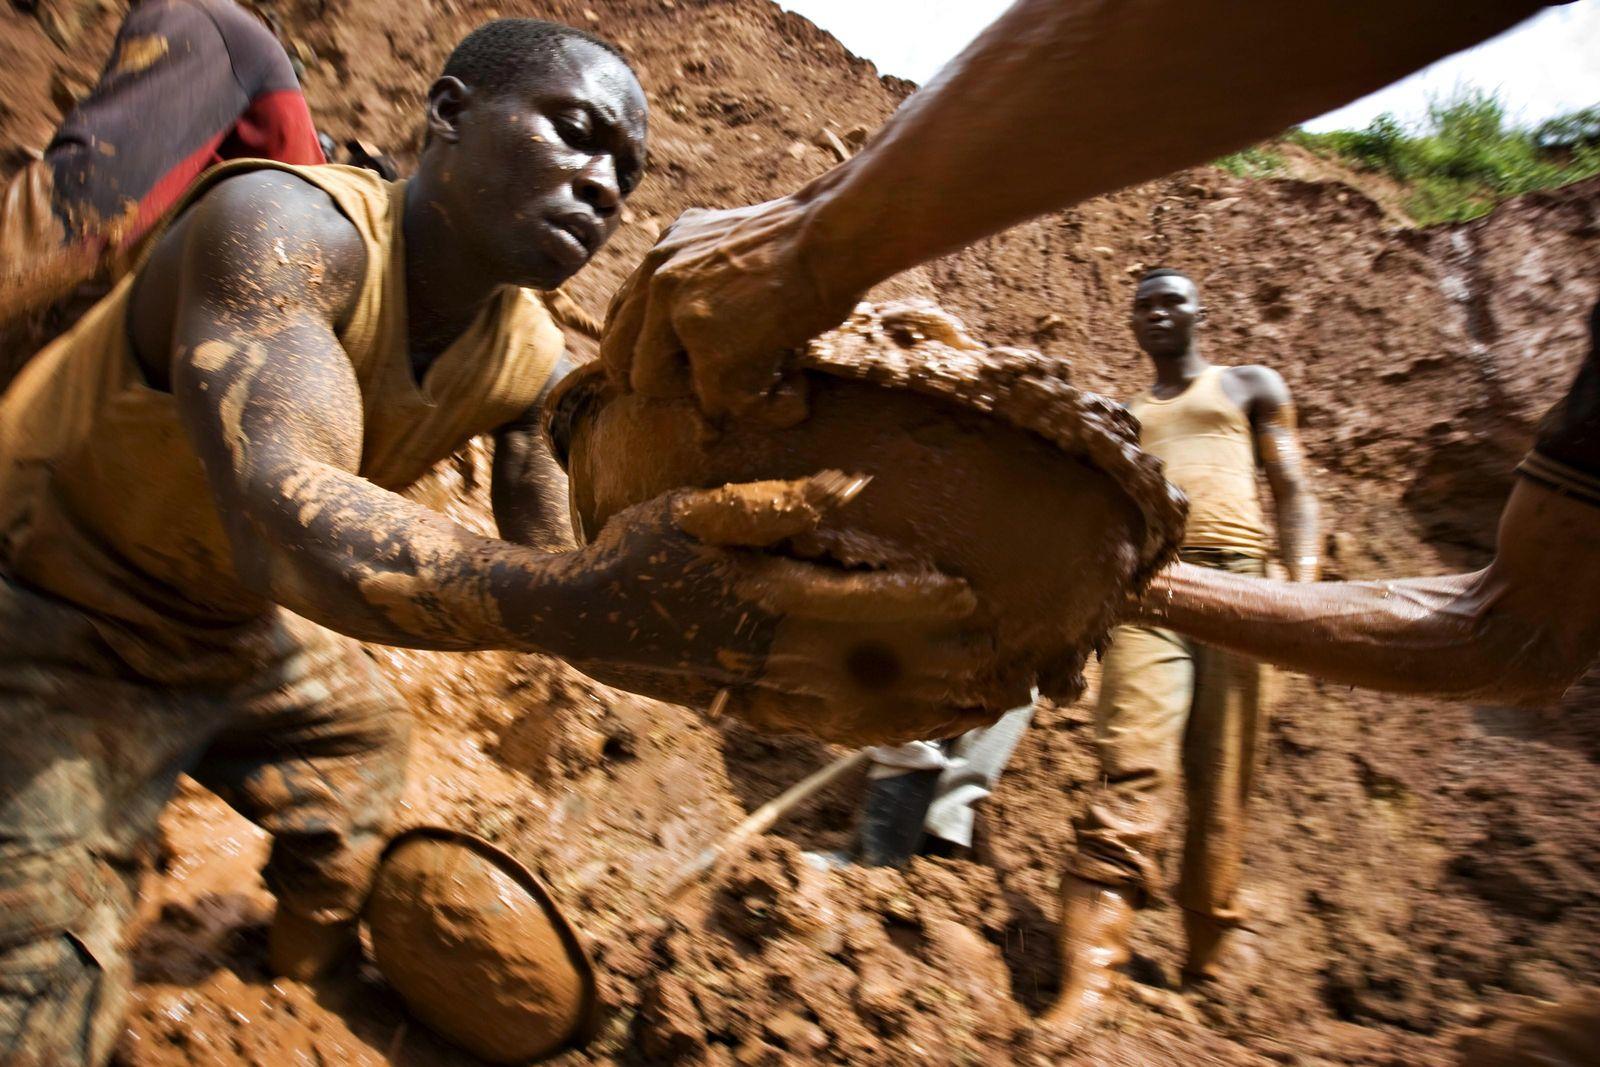 Gold-Mine / Kongo